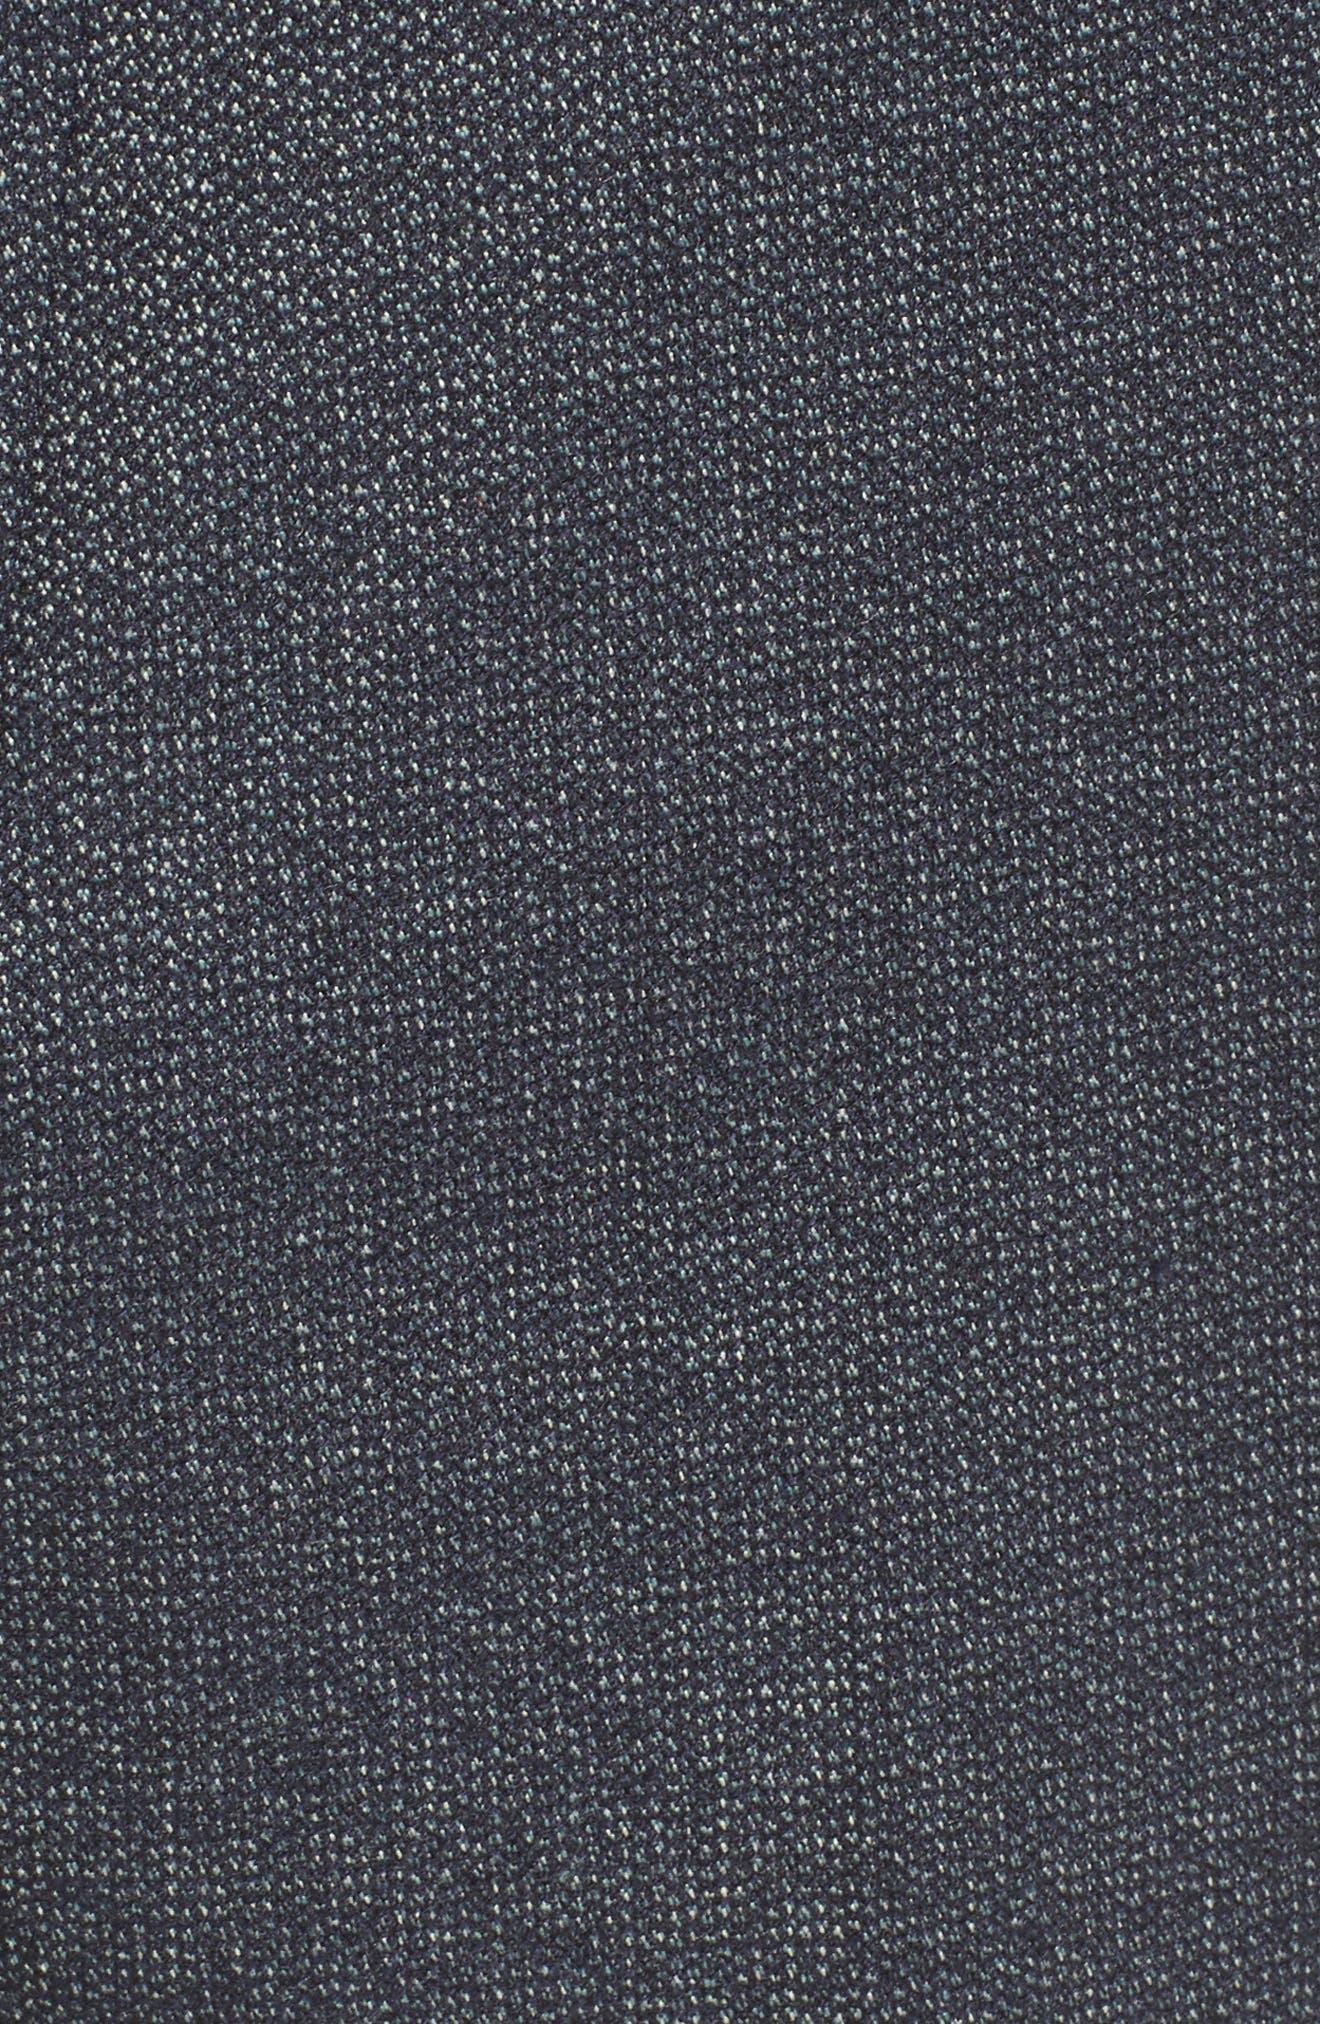 Beektro Trim Fit Trousers,                             Alternate thumbnail 5, color,